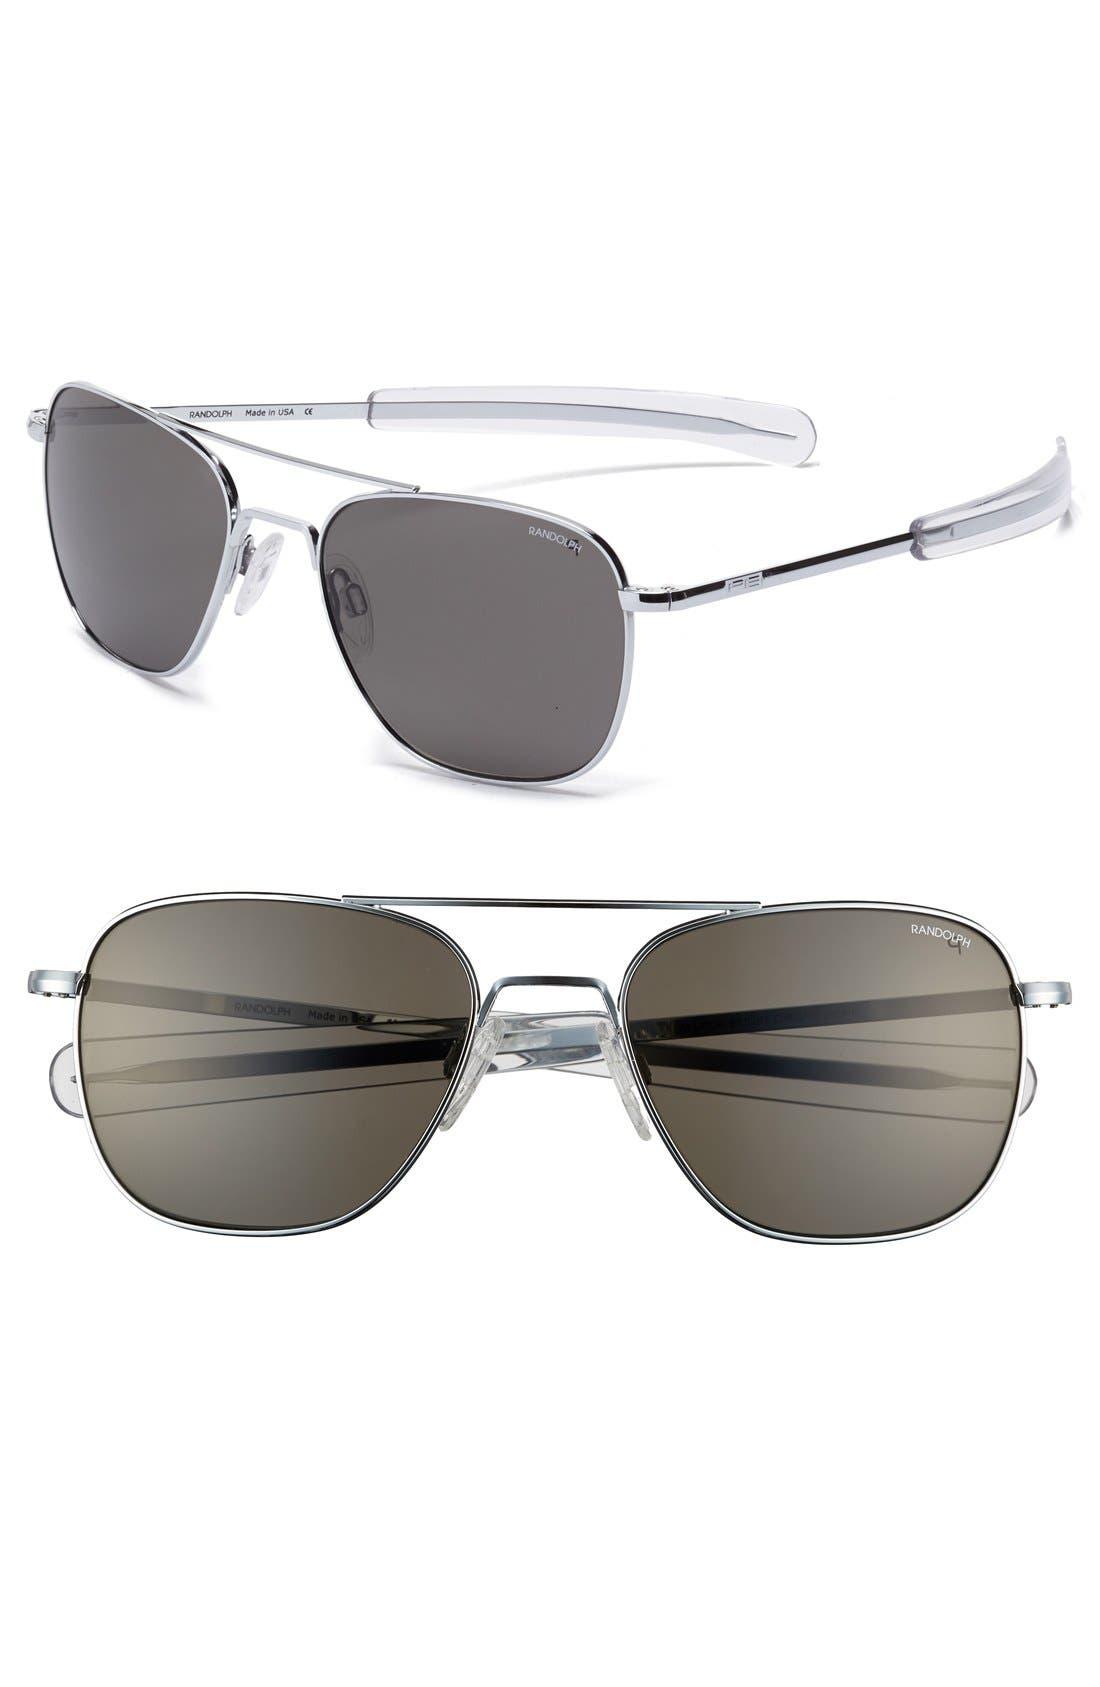 55mm Polarized Aviator Sunglasses,                         Main,                         color, 045